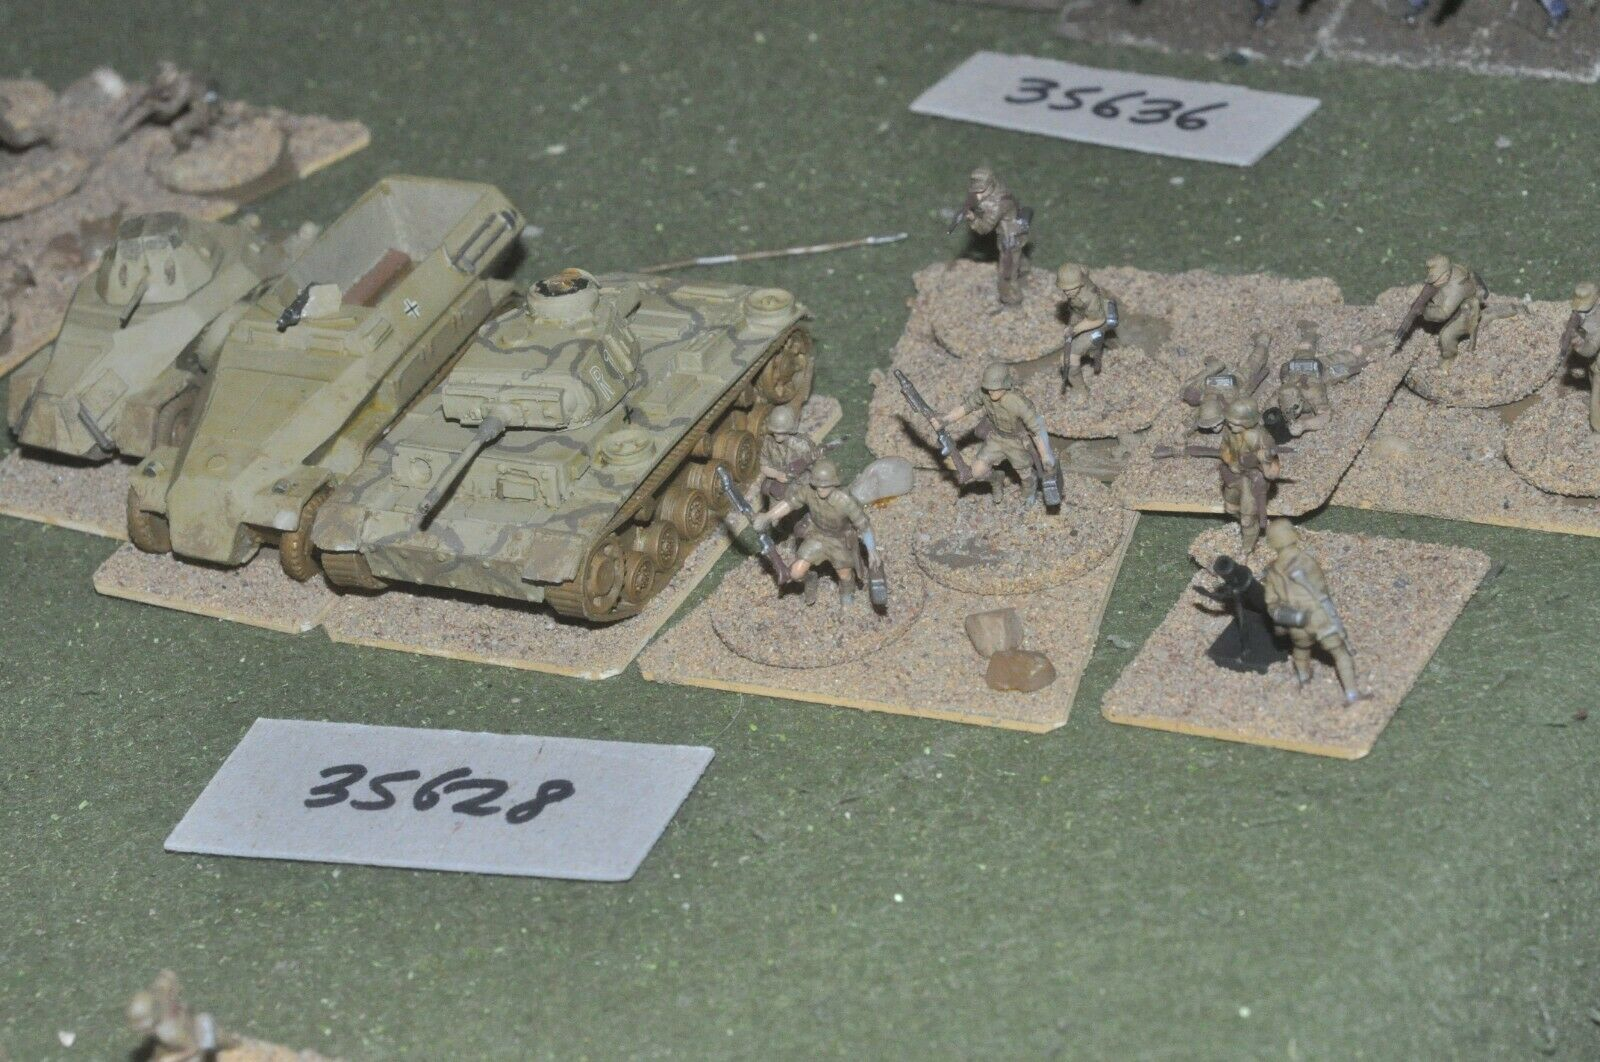 20mm WW2   german - battle group (plastic) - vehicles (35628)